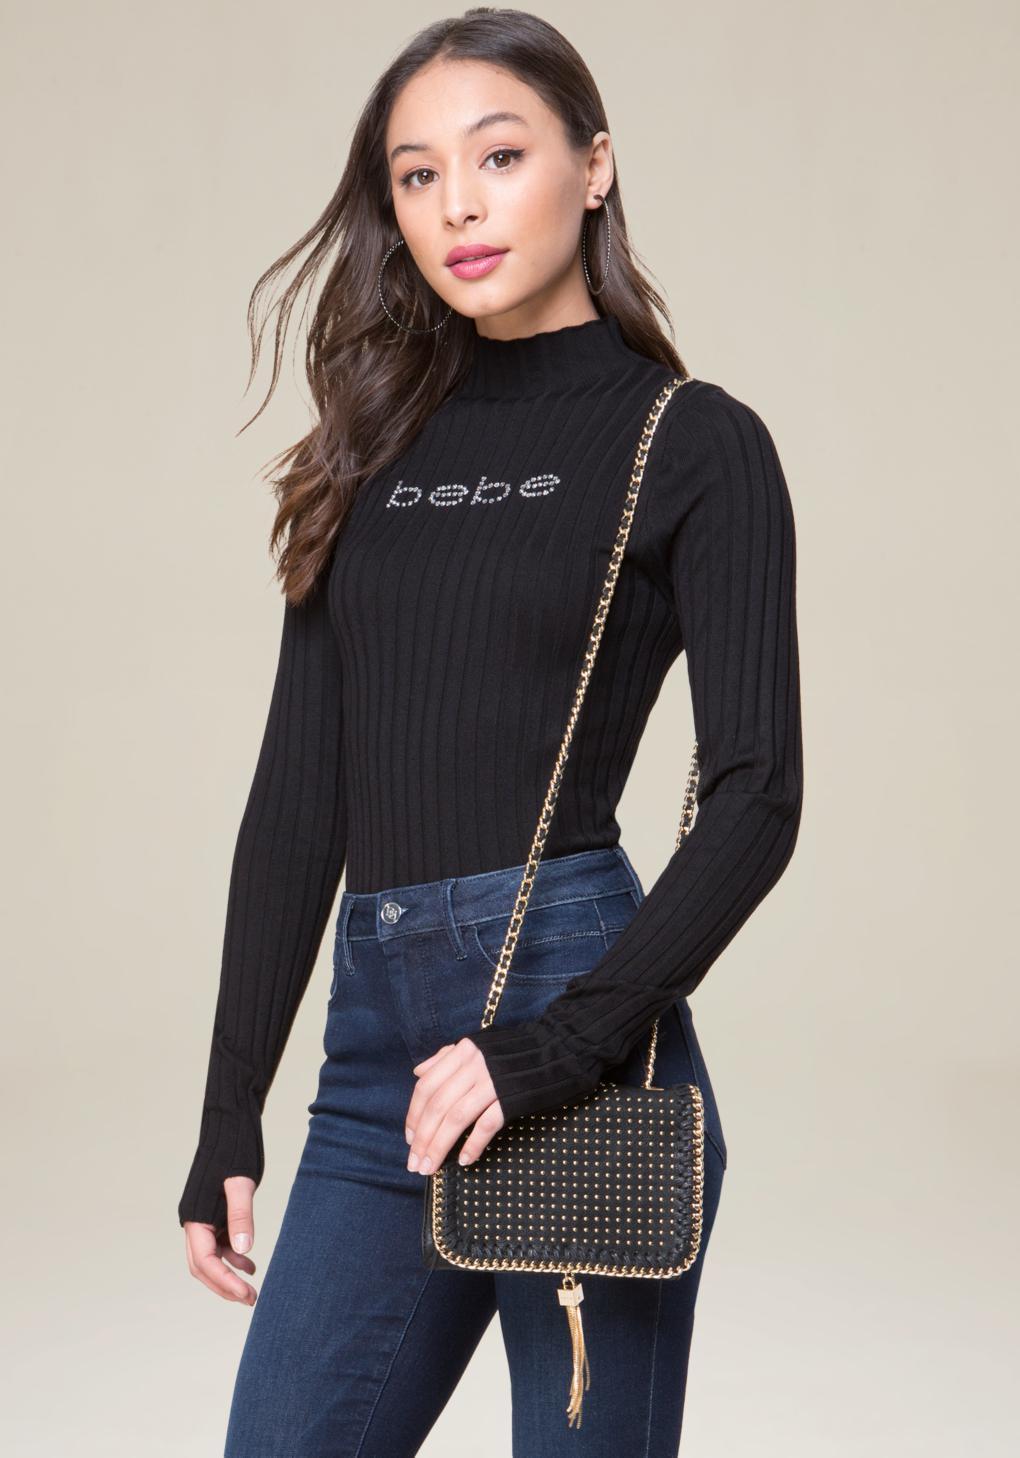 Bebe Isabella Crossbody Bag in Black